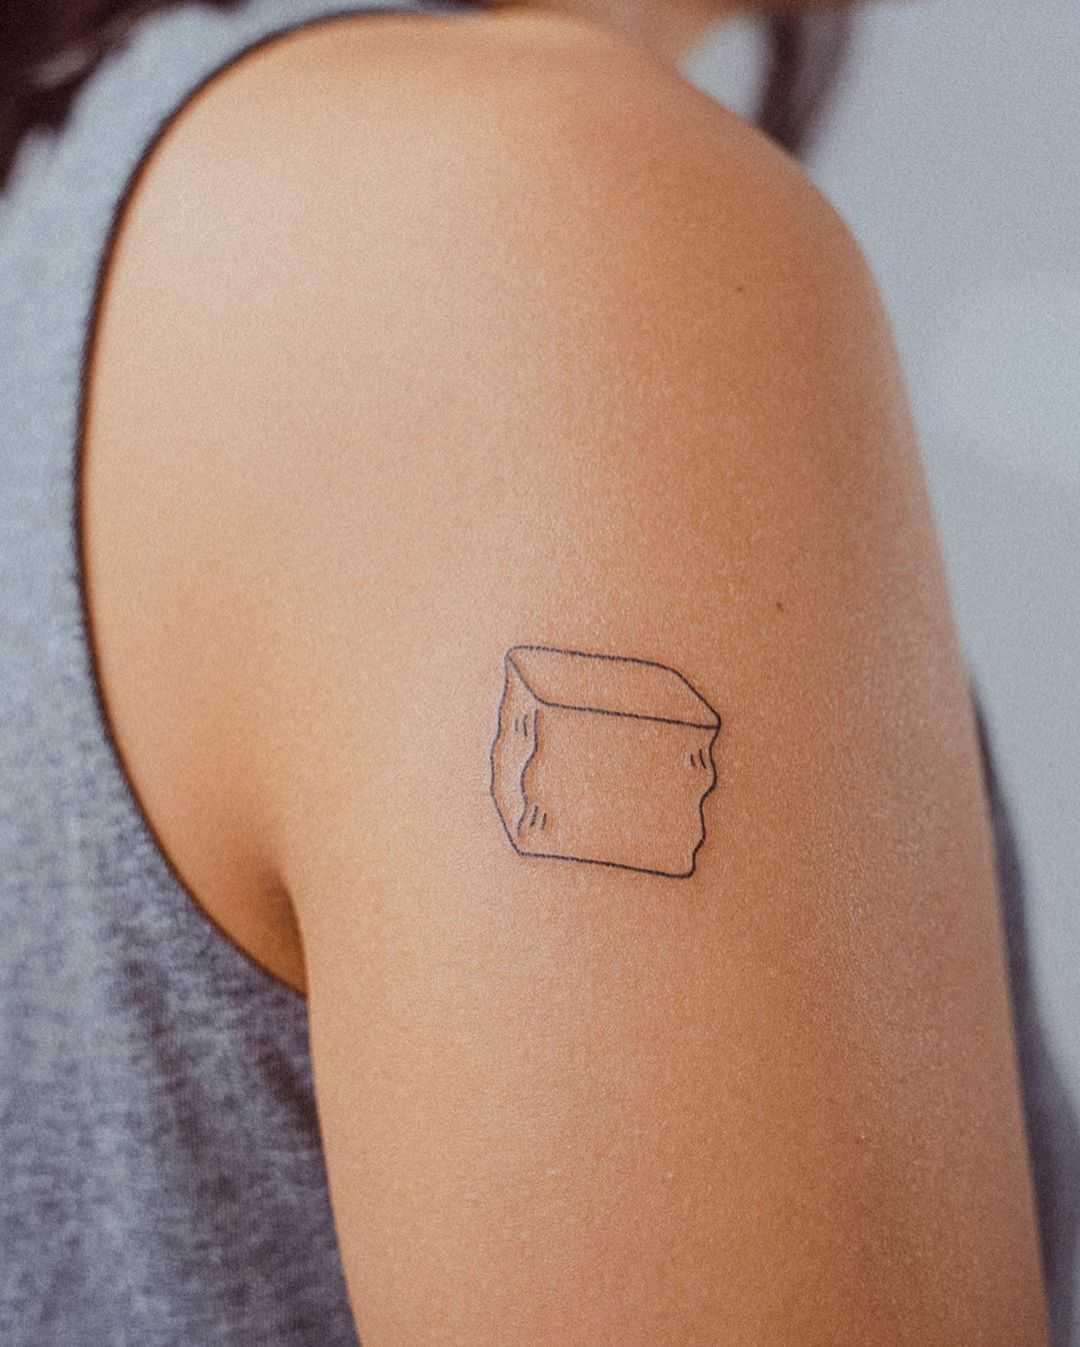 Minimalist ice cube by tattooist Bongkee